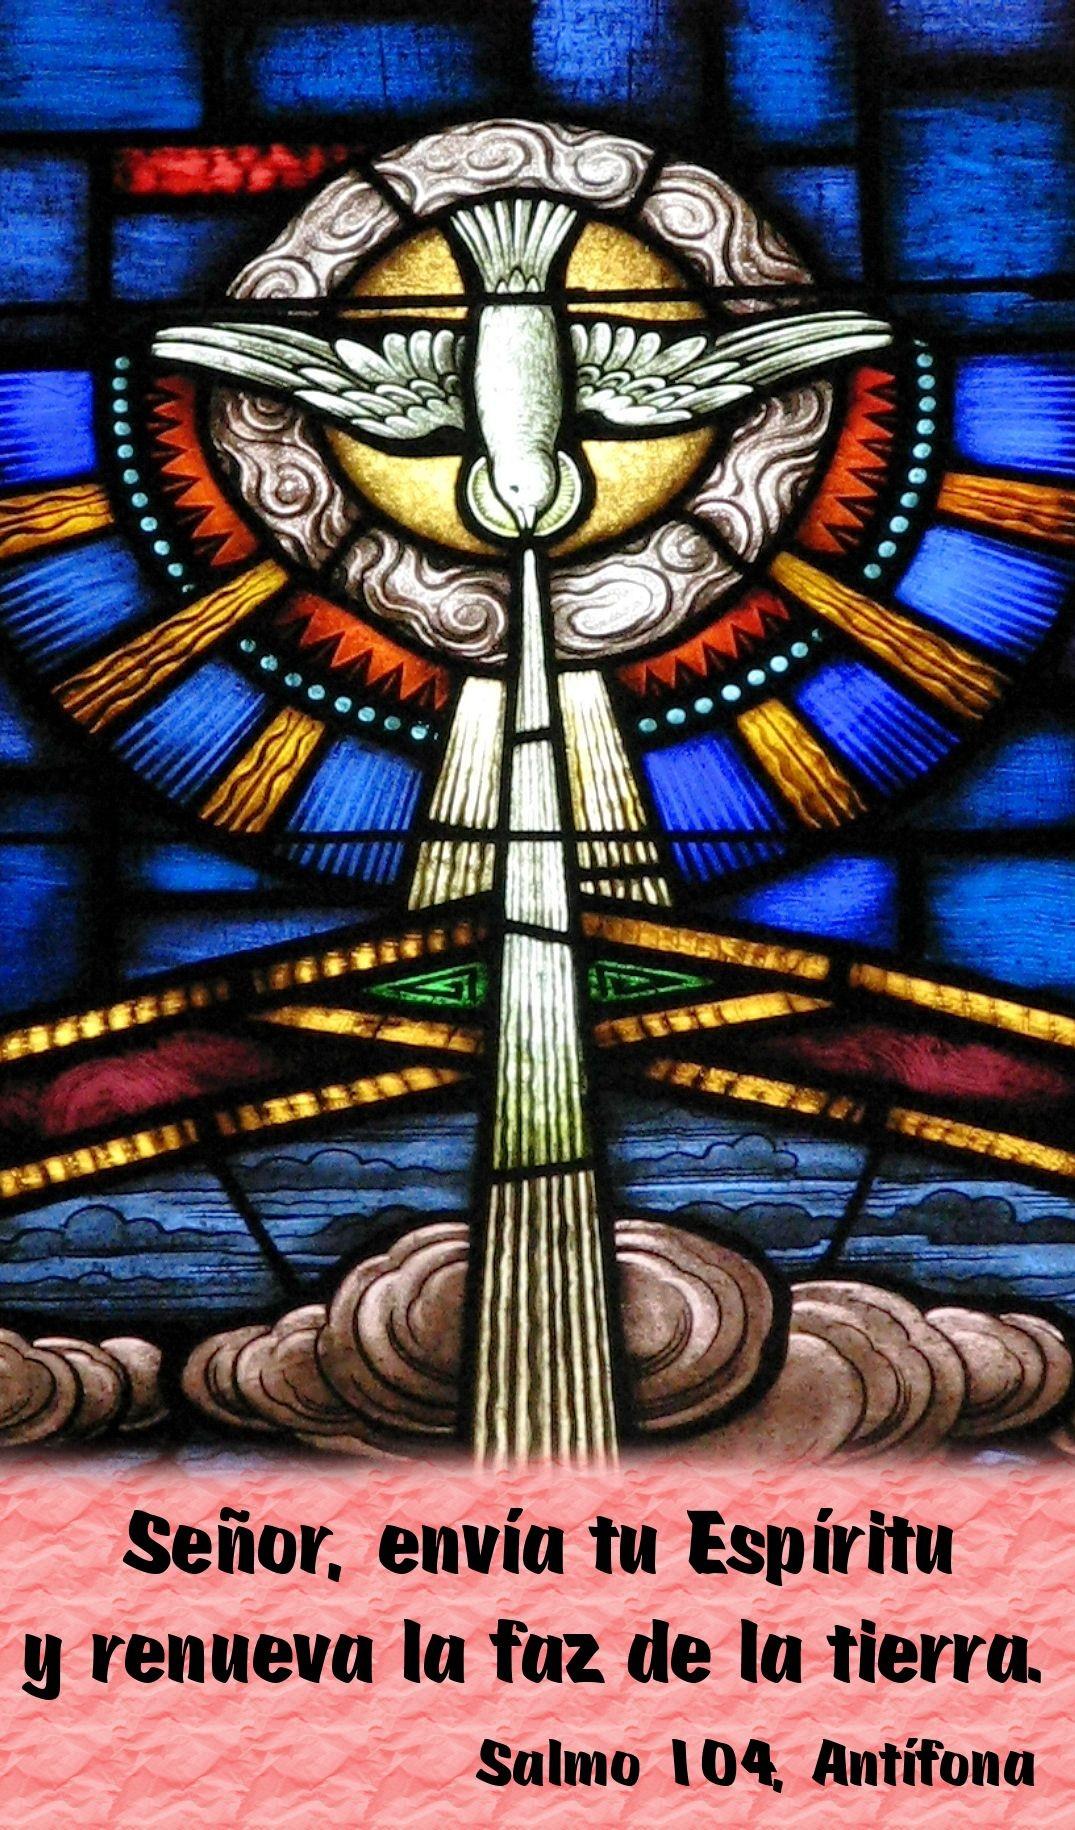 Se±or enva tu Espritu y renueva la faz de la tierra Salmo 104